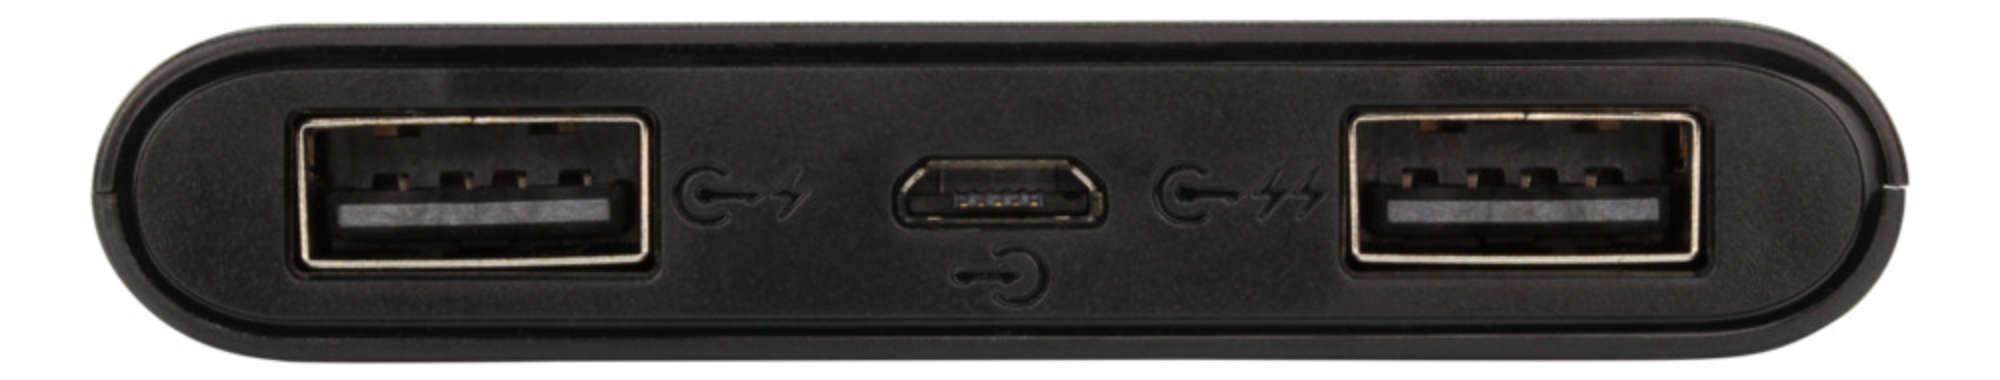 1700-0066_MM-5V-Powerbank5.4-5400-bu-4